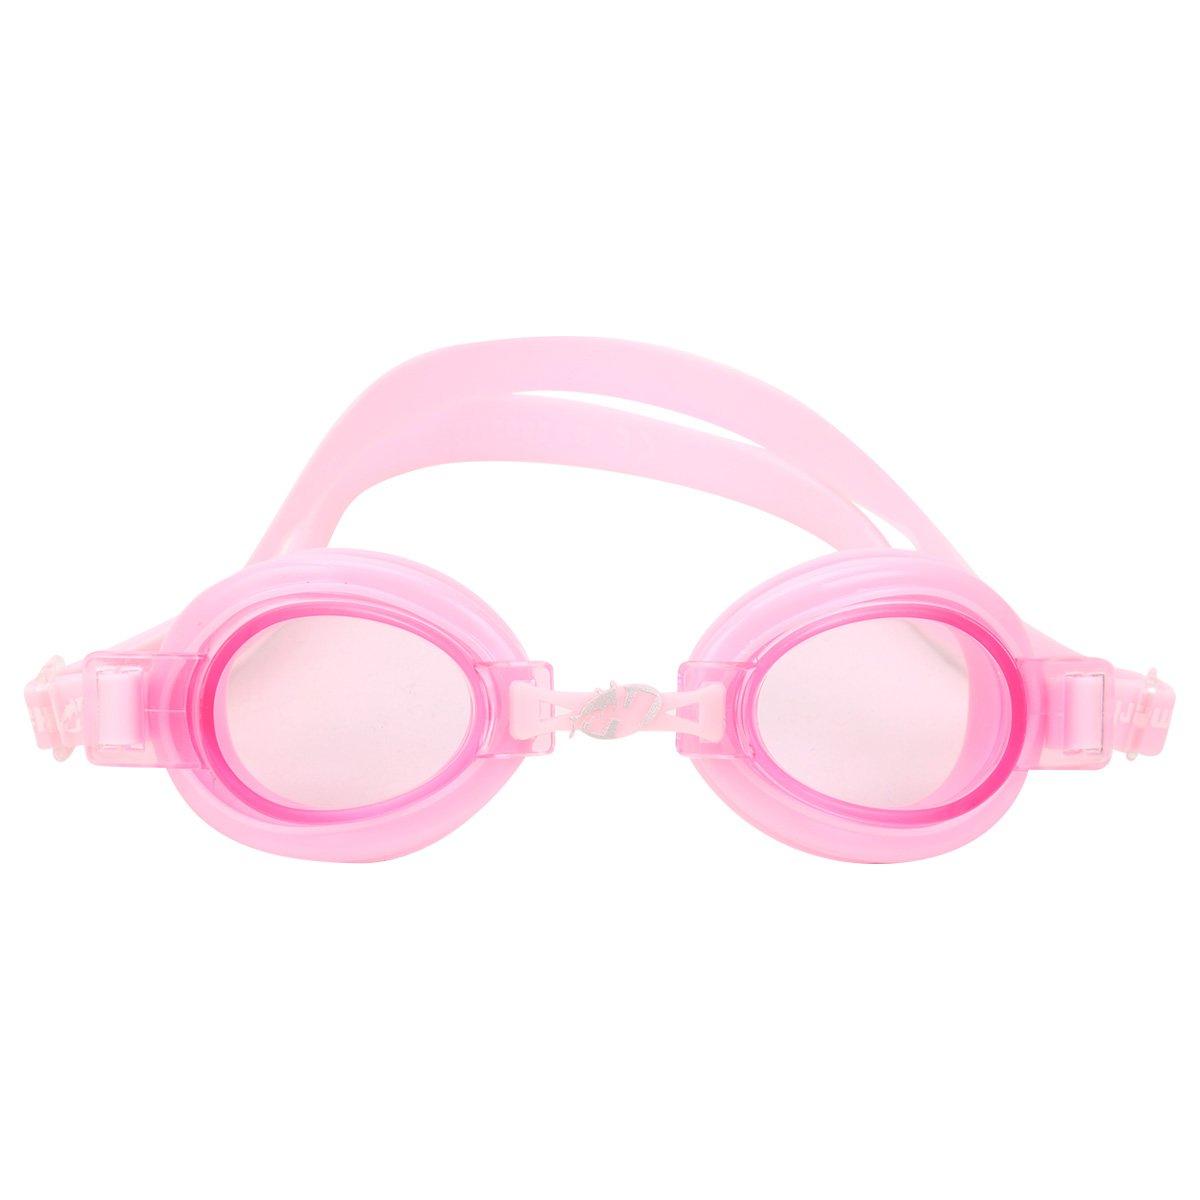 f76c32bd410f1 Óculos Hammerhead Nat Focus Infantil 3.0 - Compre Agora   Netshoes